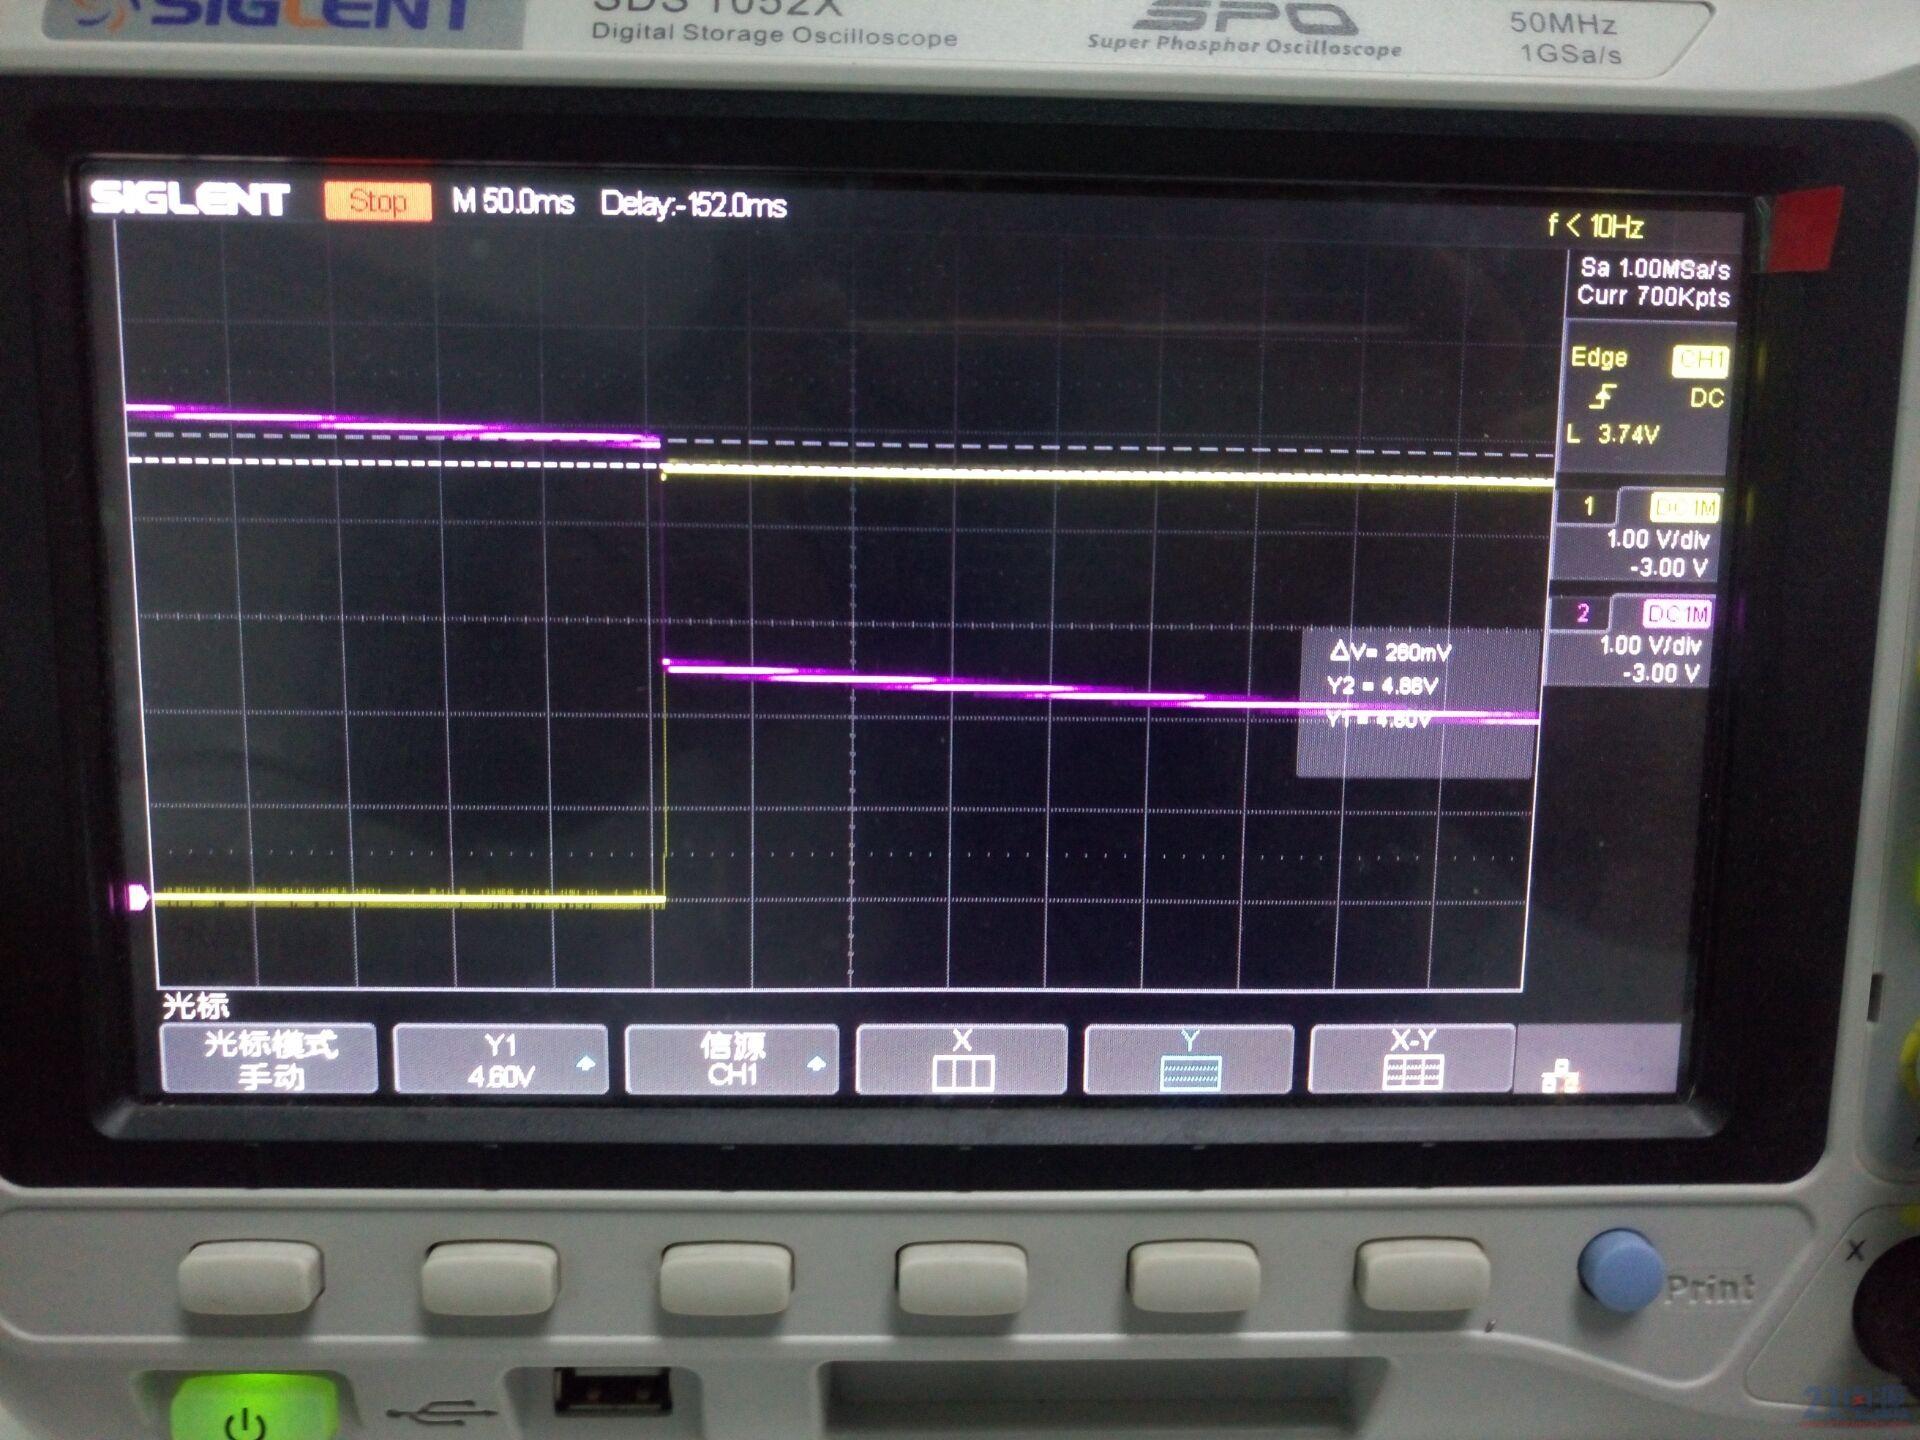 5v来电切换升压或者充电电路,想请教5个问题, 1.